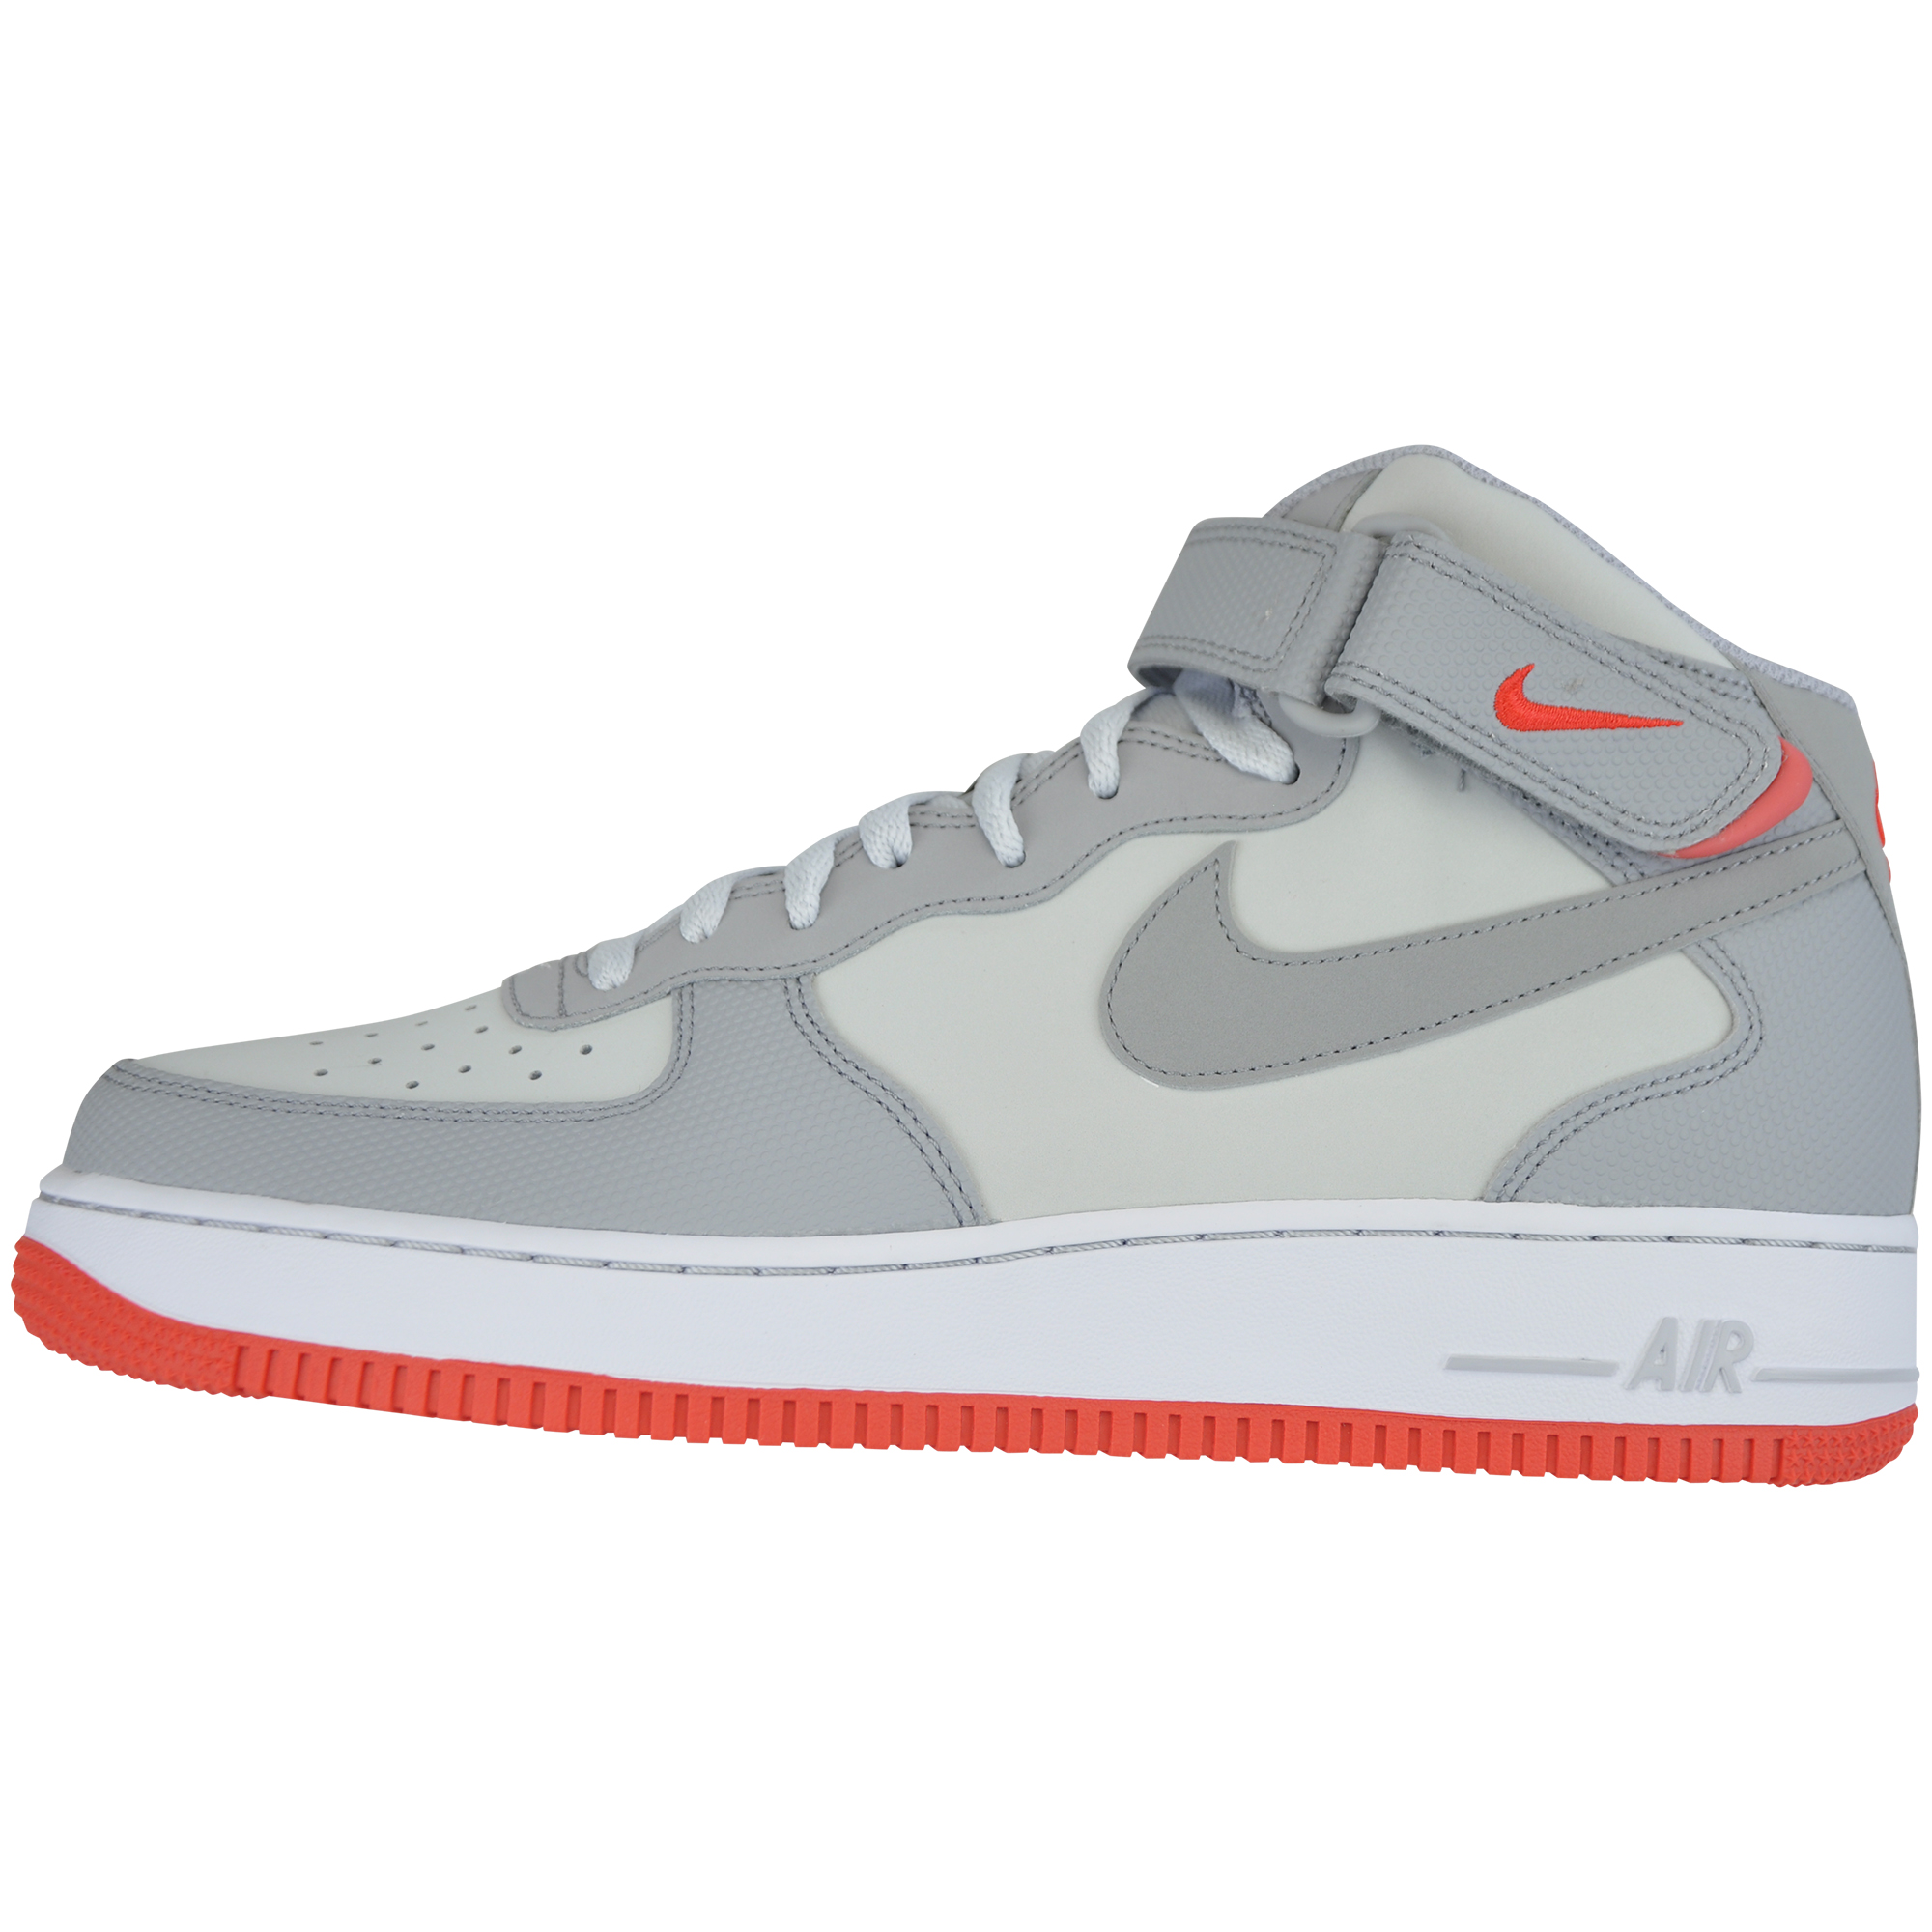 nike air force 1 one mid 39 07 basketball lifestyle sneaker air jorden dunk high ebay